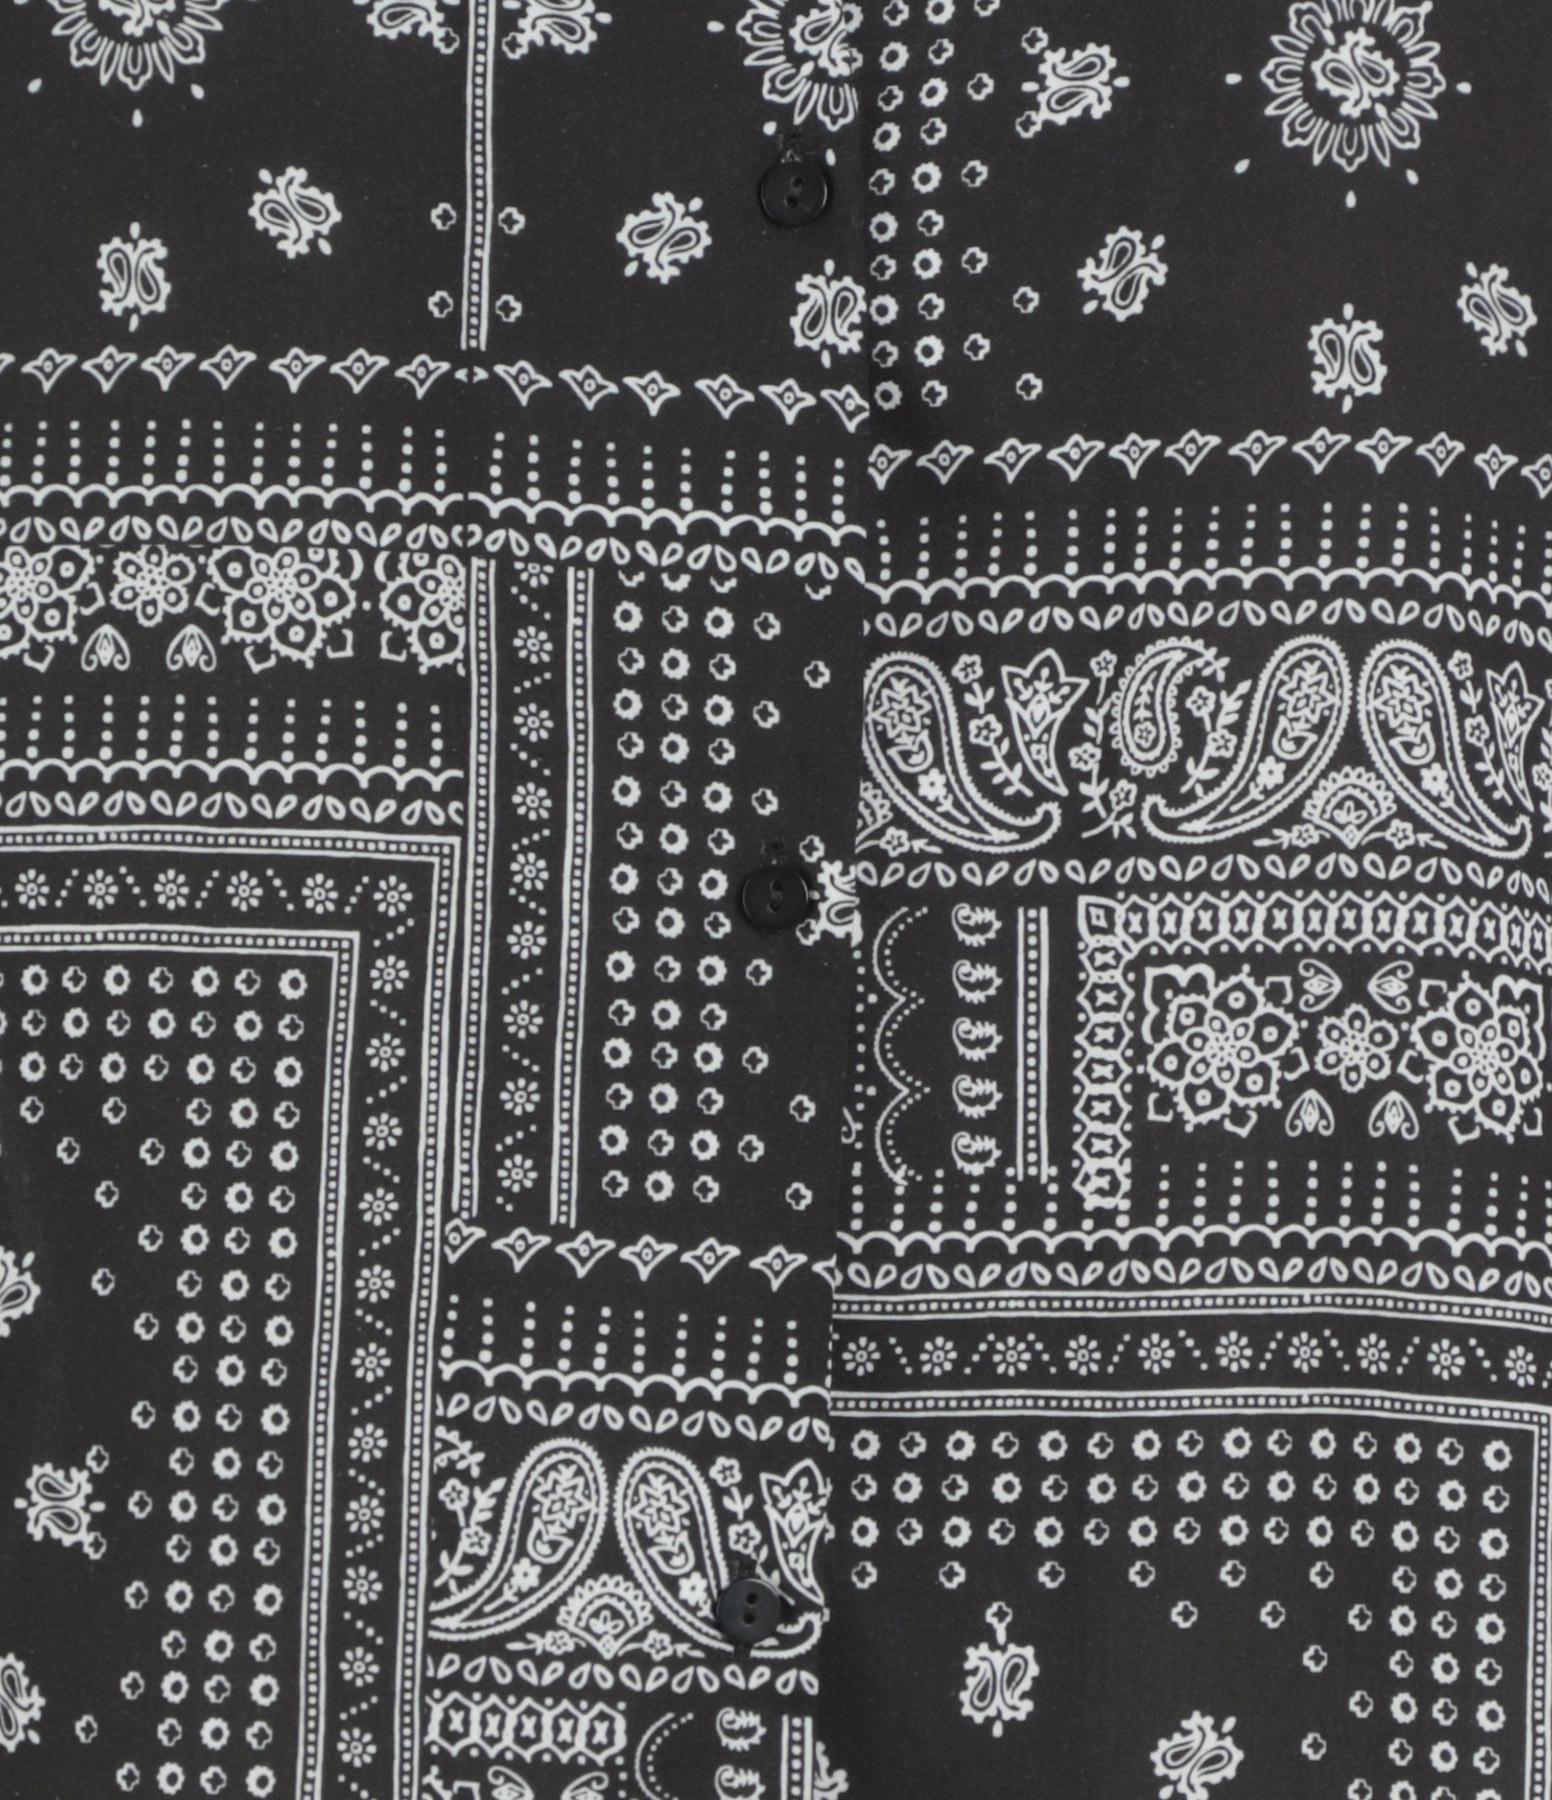 JEANNE VOULAND - Chemise Malacca Oversize Bandana Noir Blanc